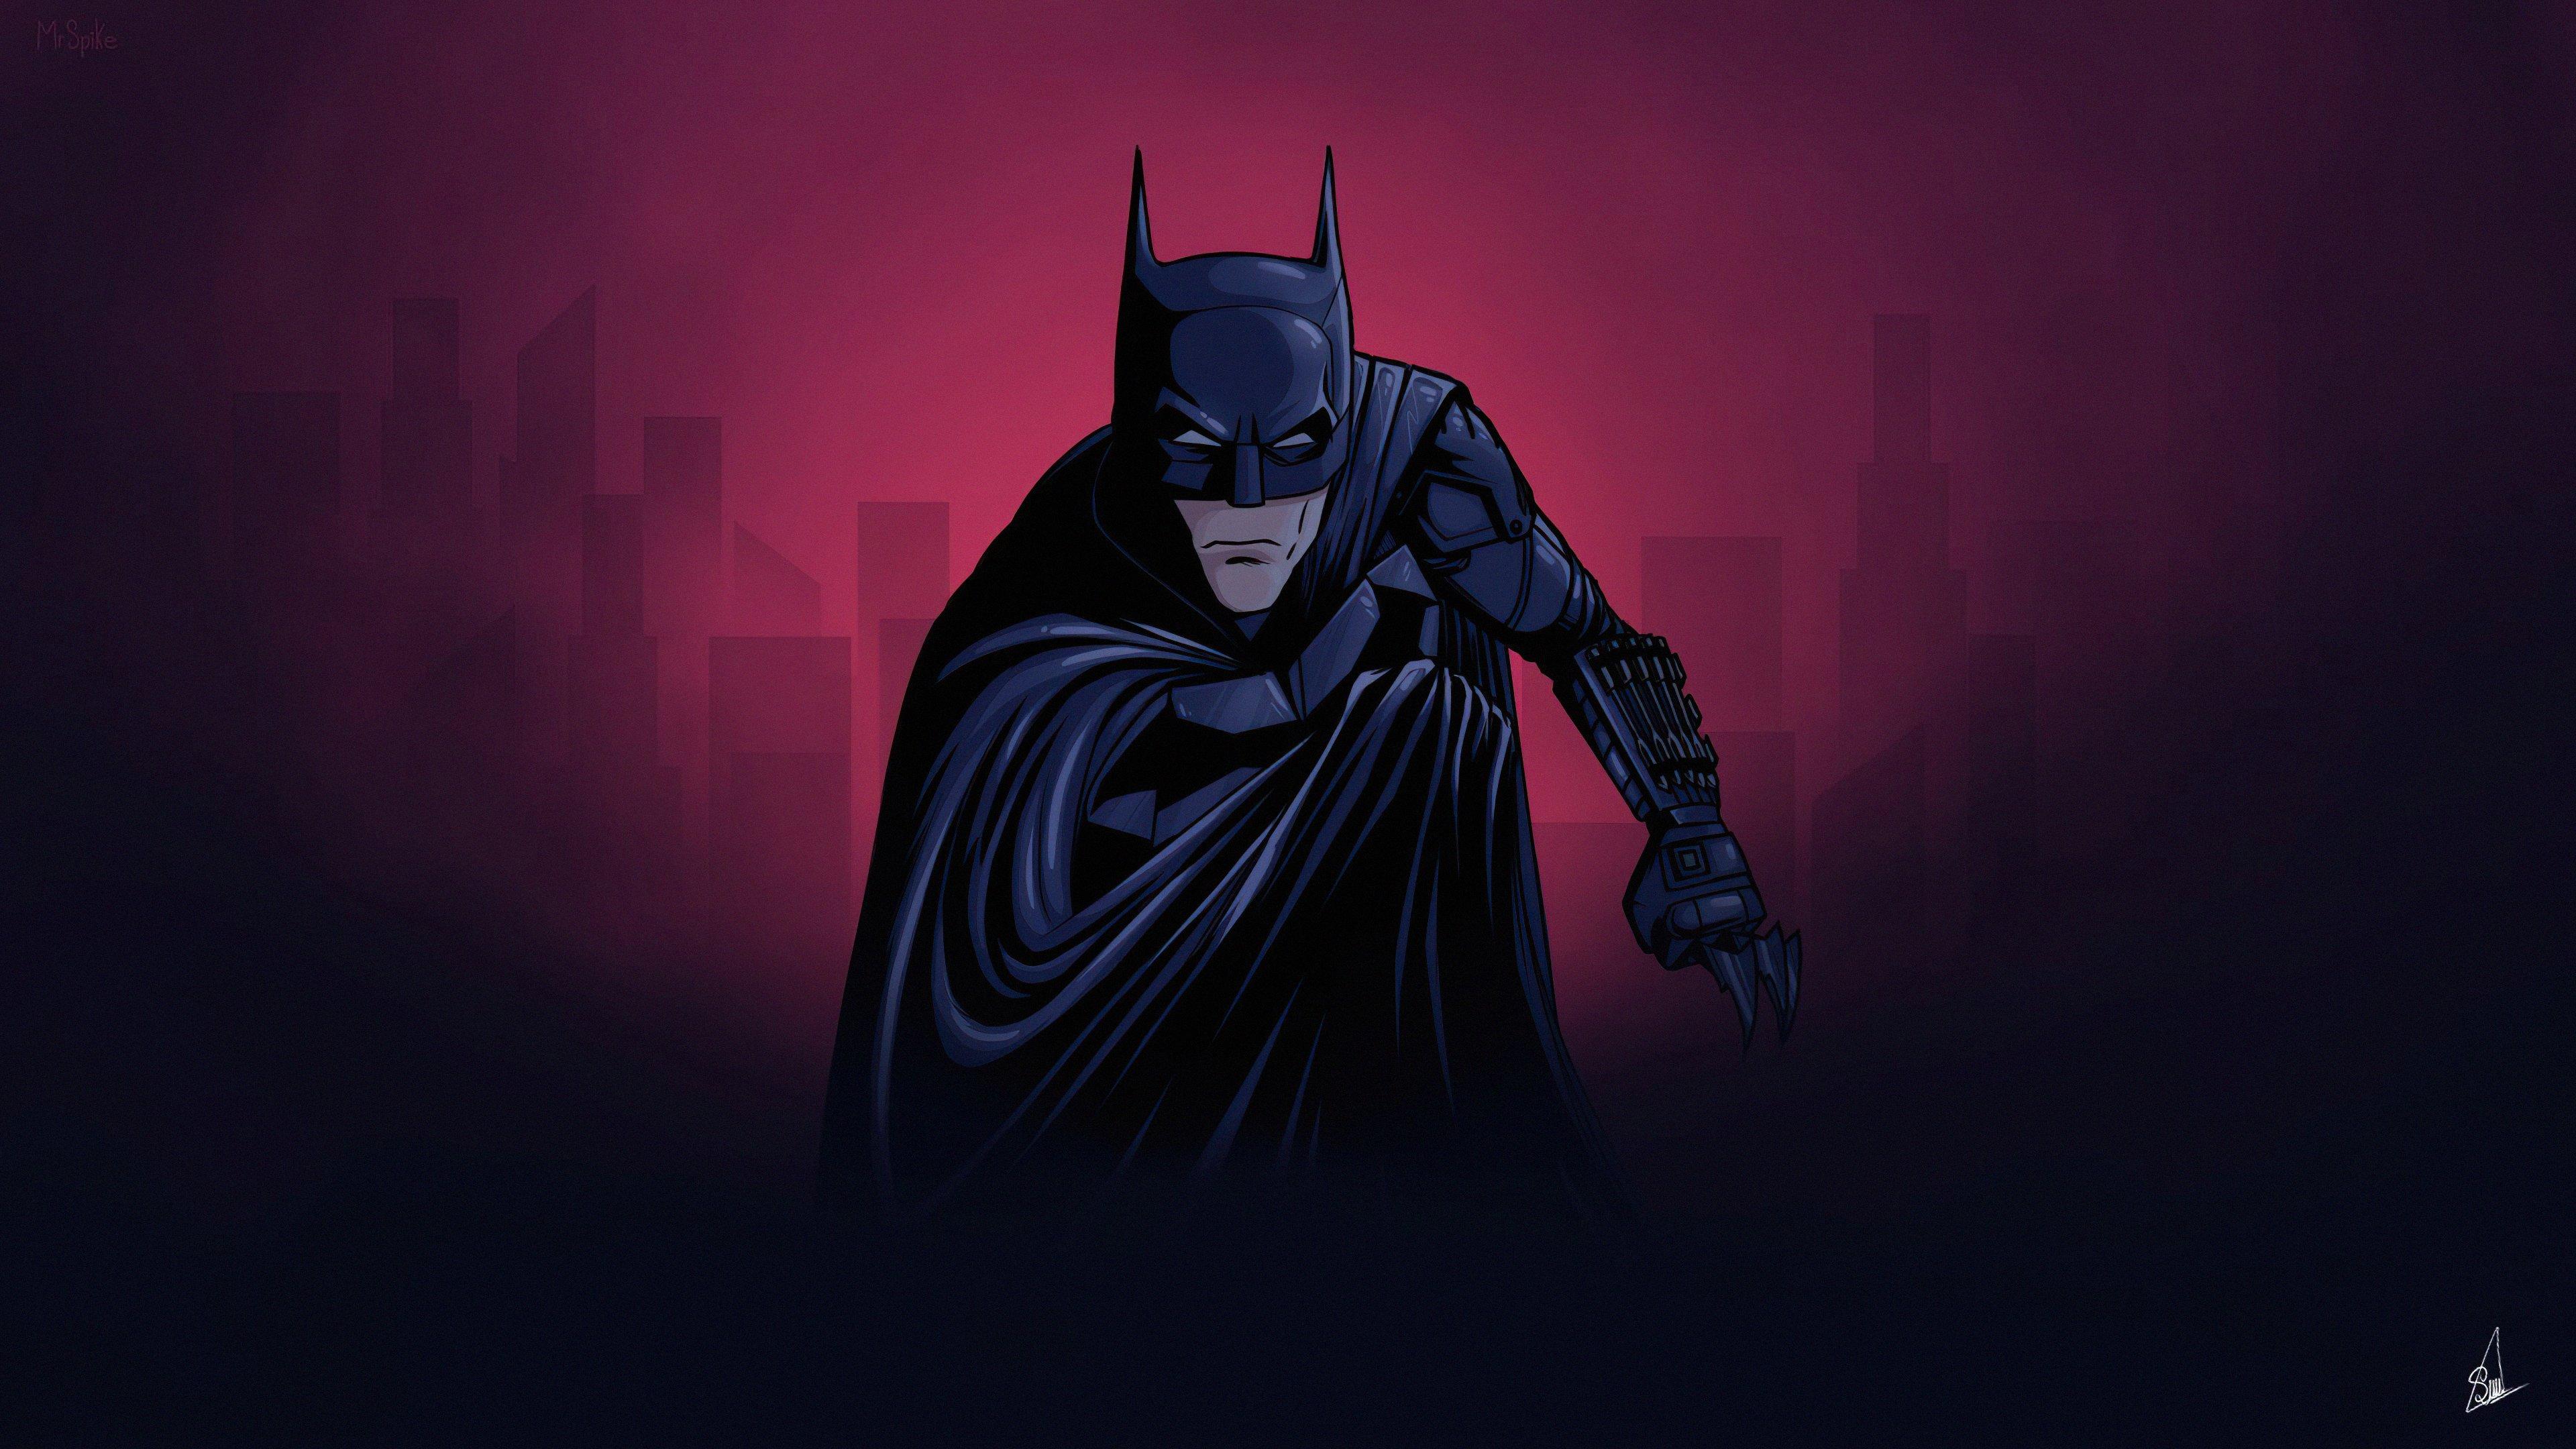 Fondos de pantalla Batman Dibujo